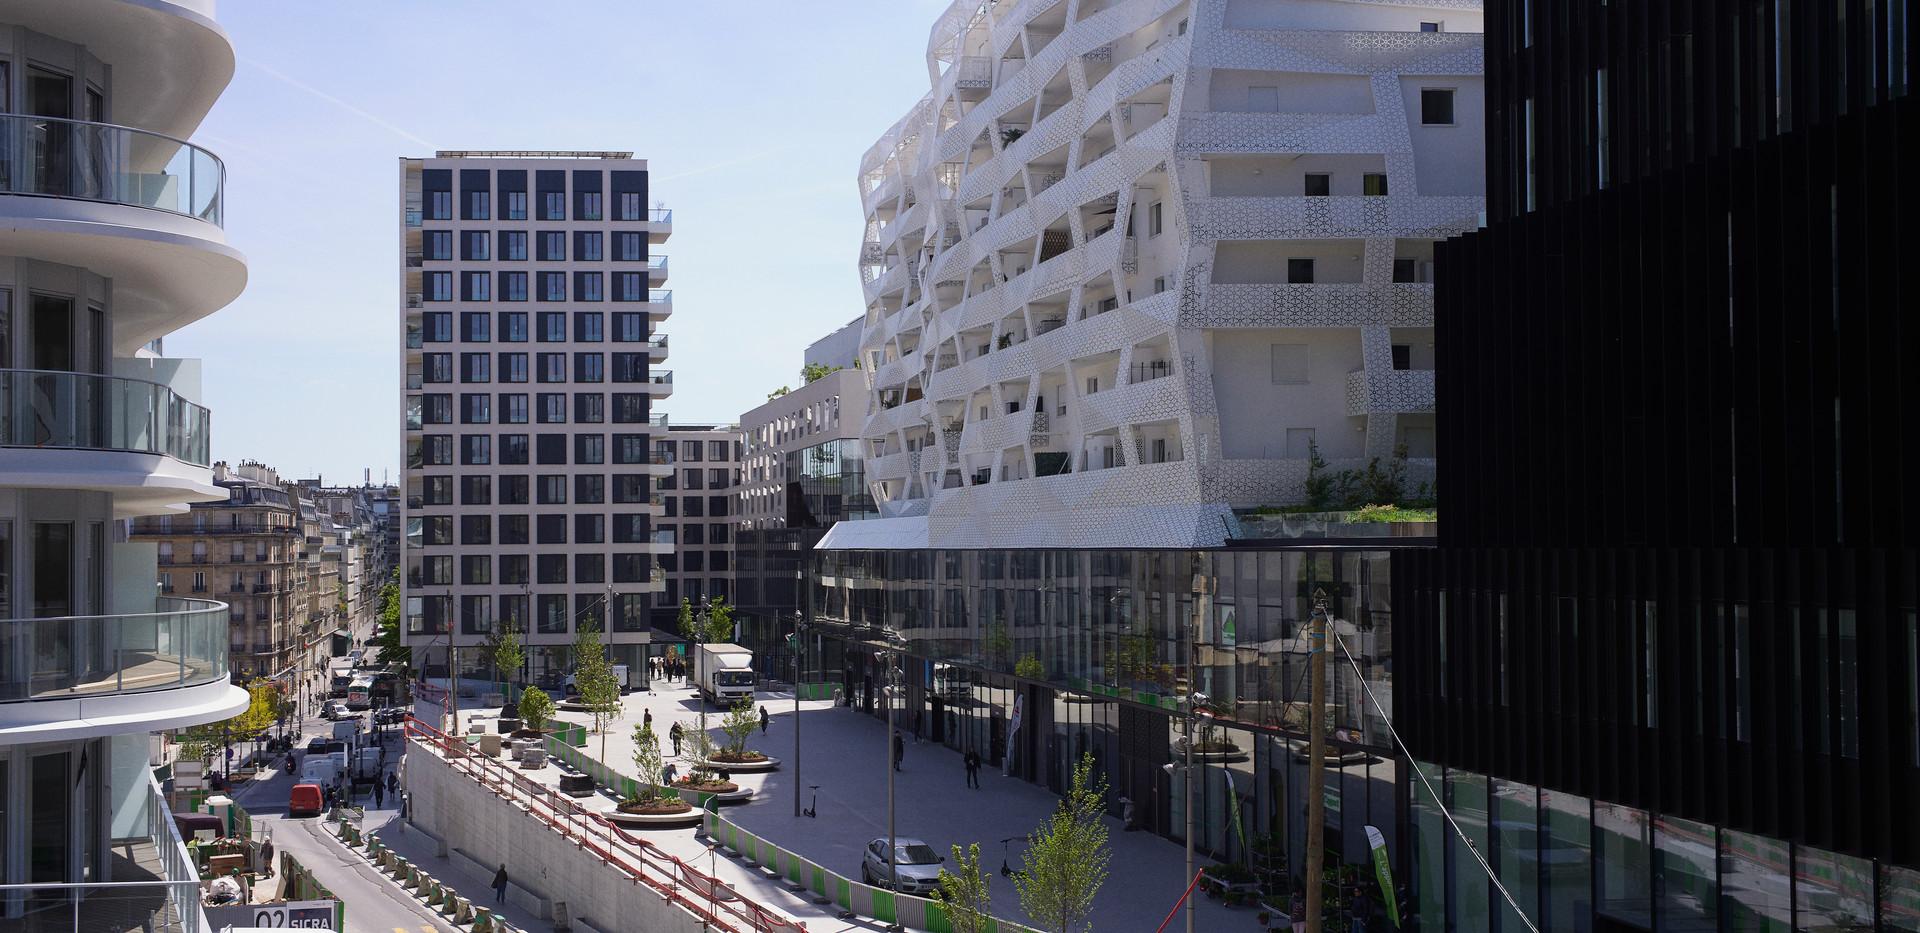 SAISON MENU Architecture - LA CHRYSALIDE